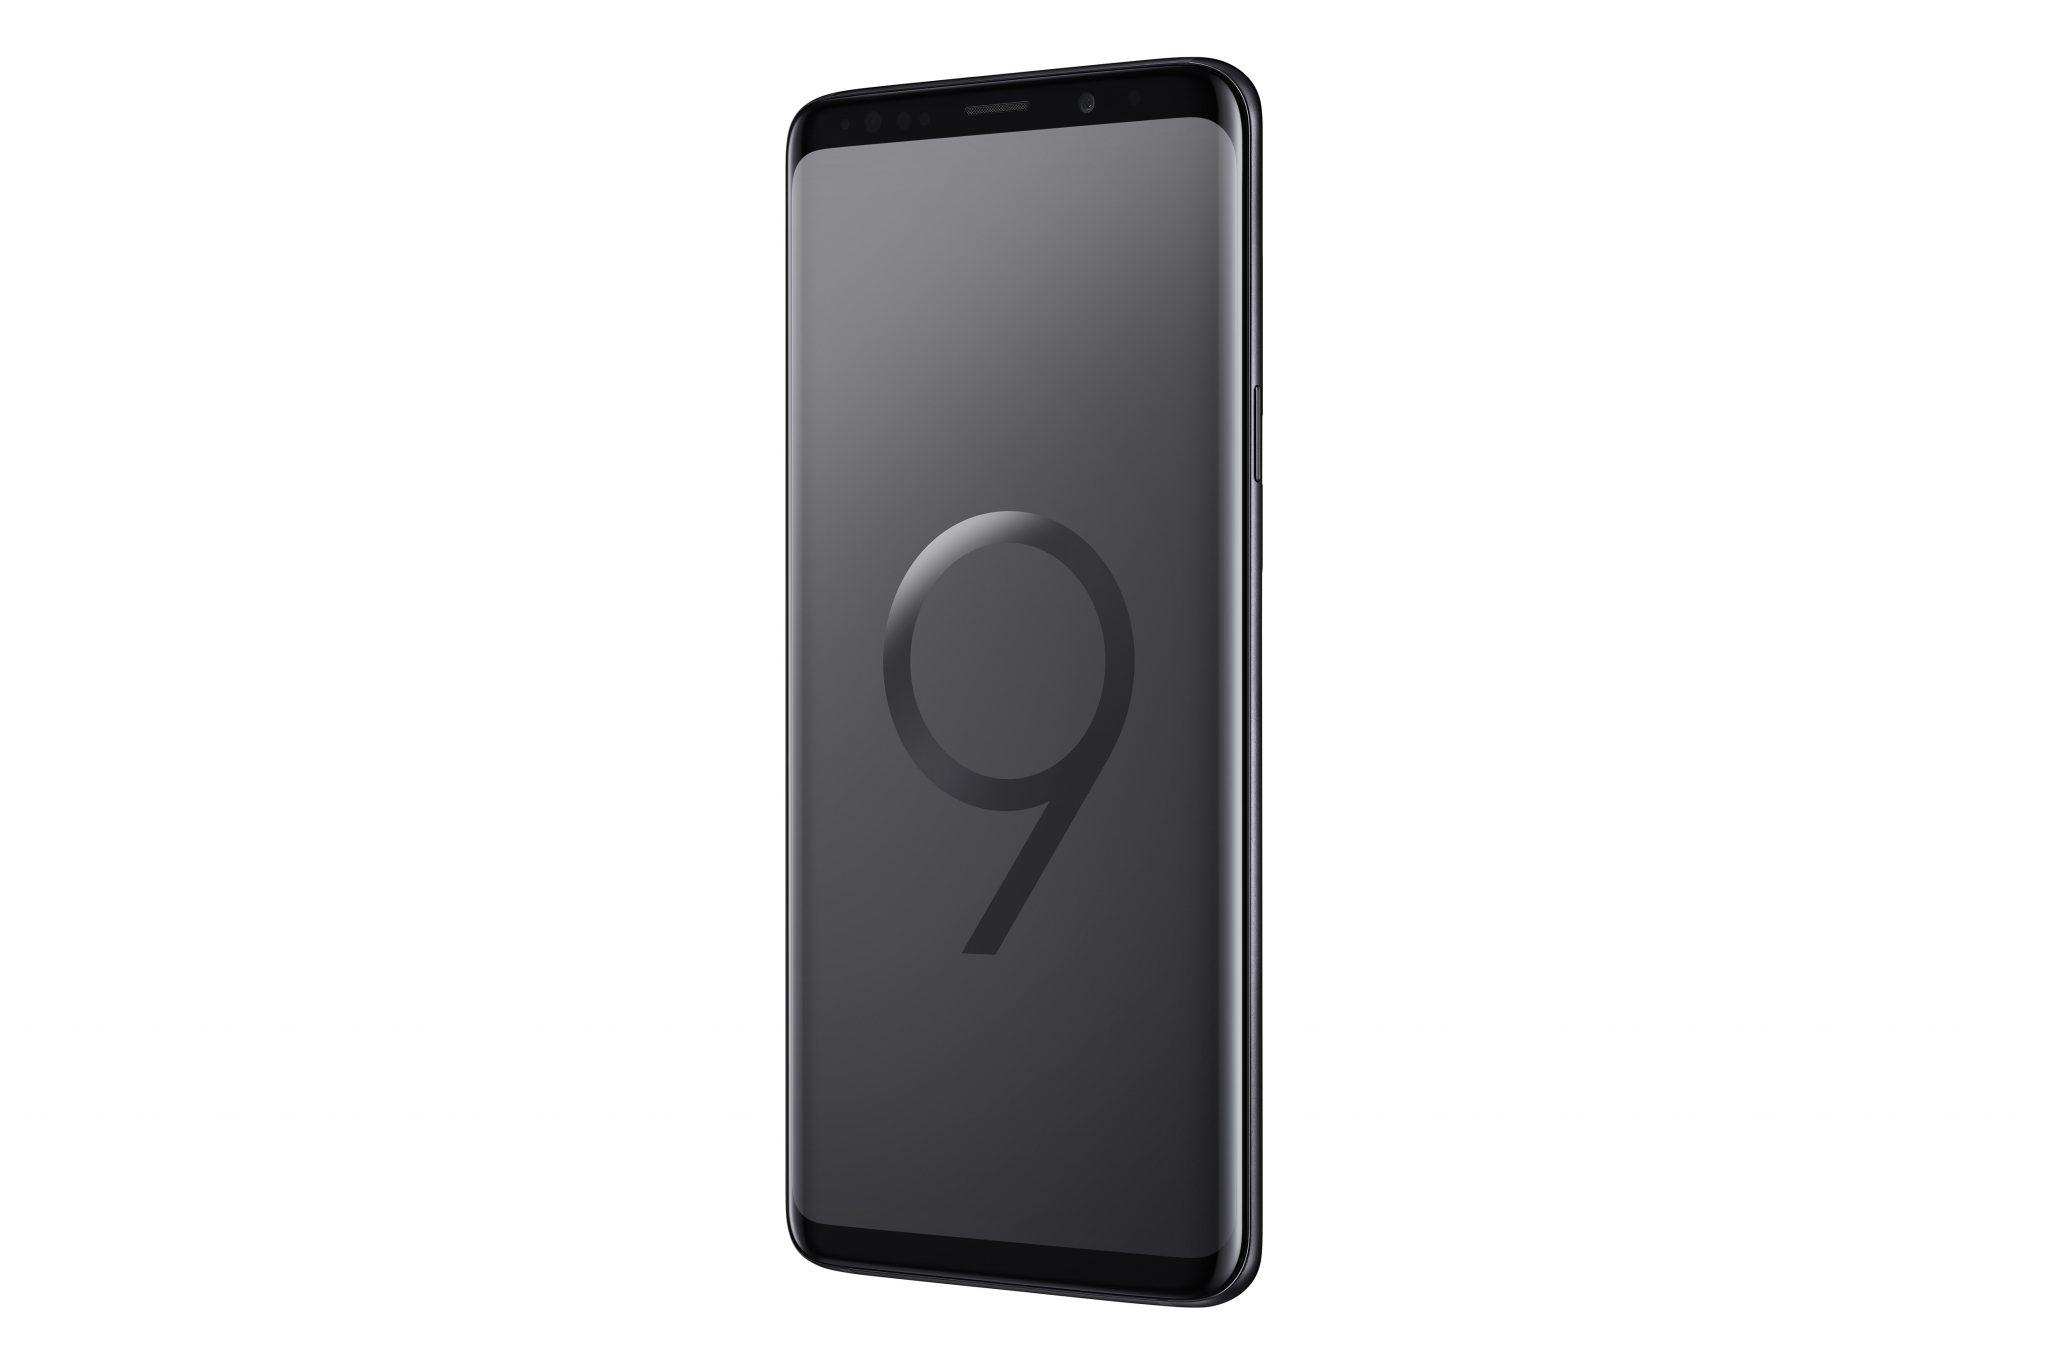 SM G965 GalaxyS9Plus R30 Black 1 - SM_G965_GalaxyS9Plus_R30_Black